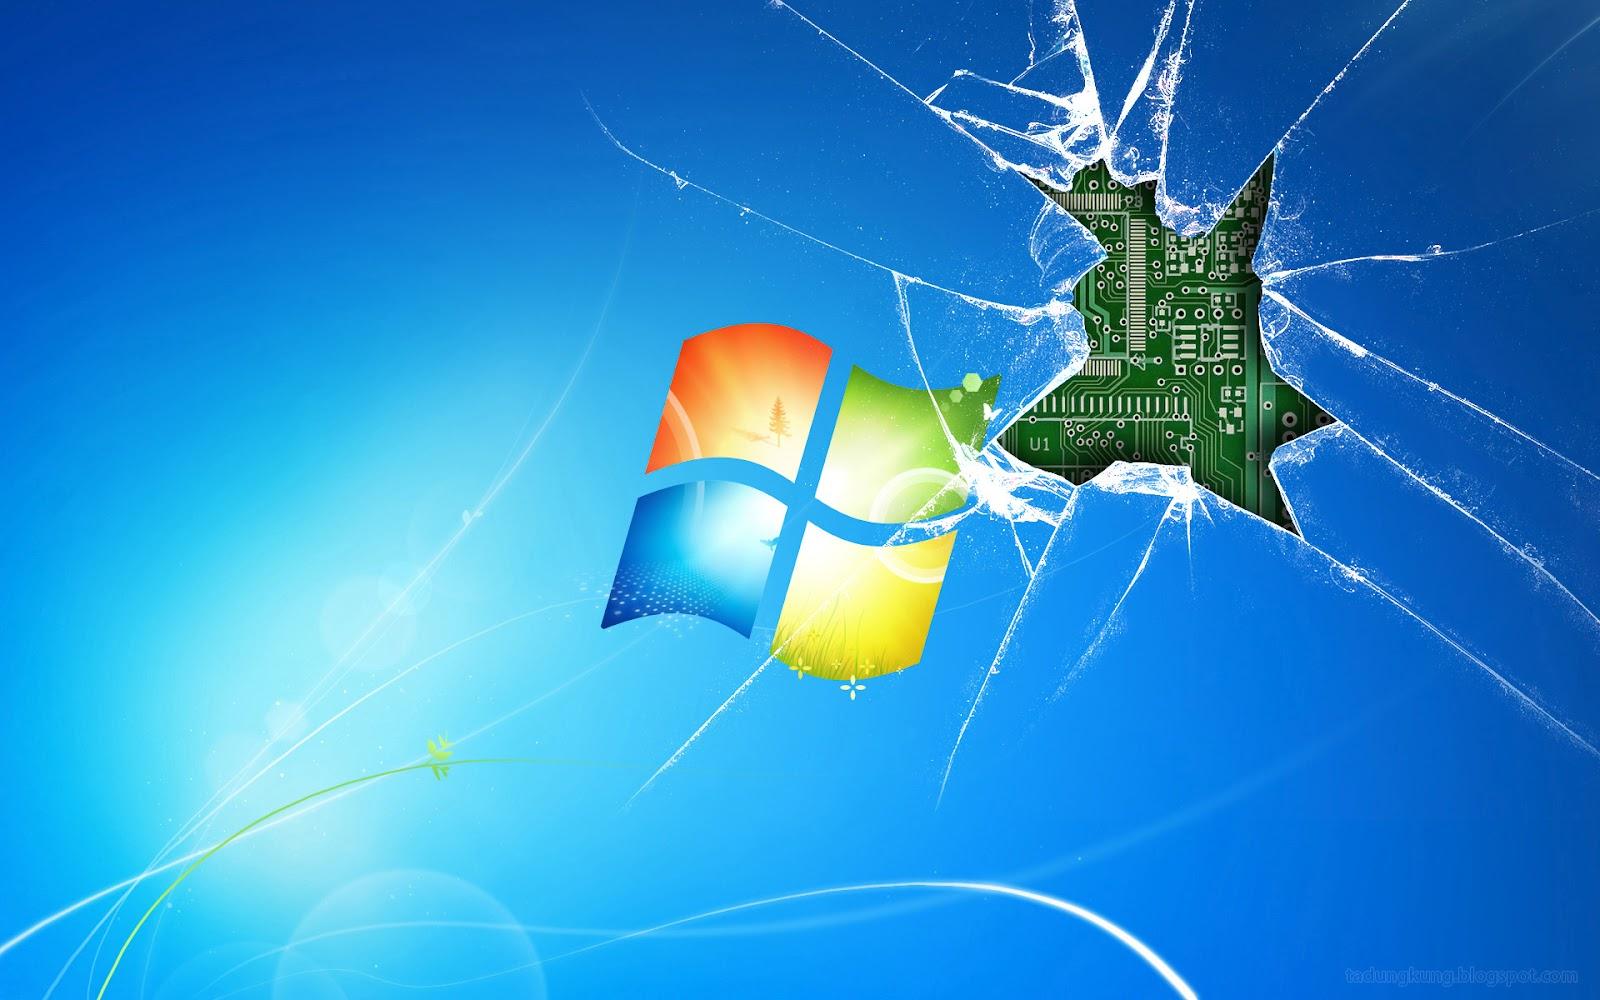 Download Wallpaper Hd Keren Untuk Android: Download 100 Wallpaper Windows 7 HD Gratis